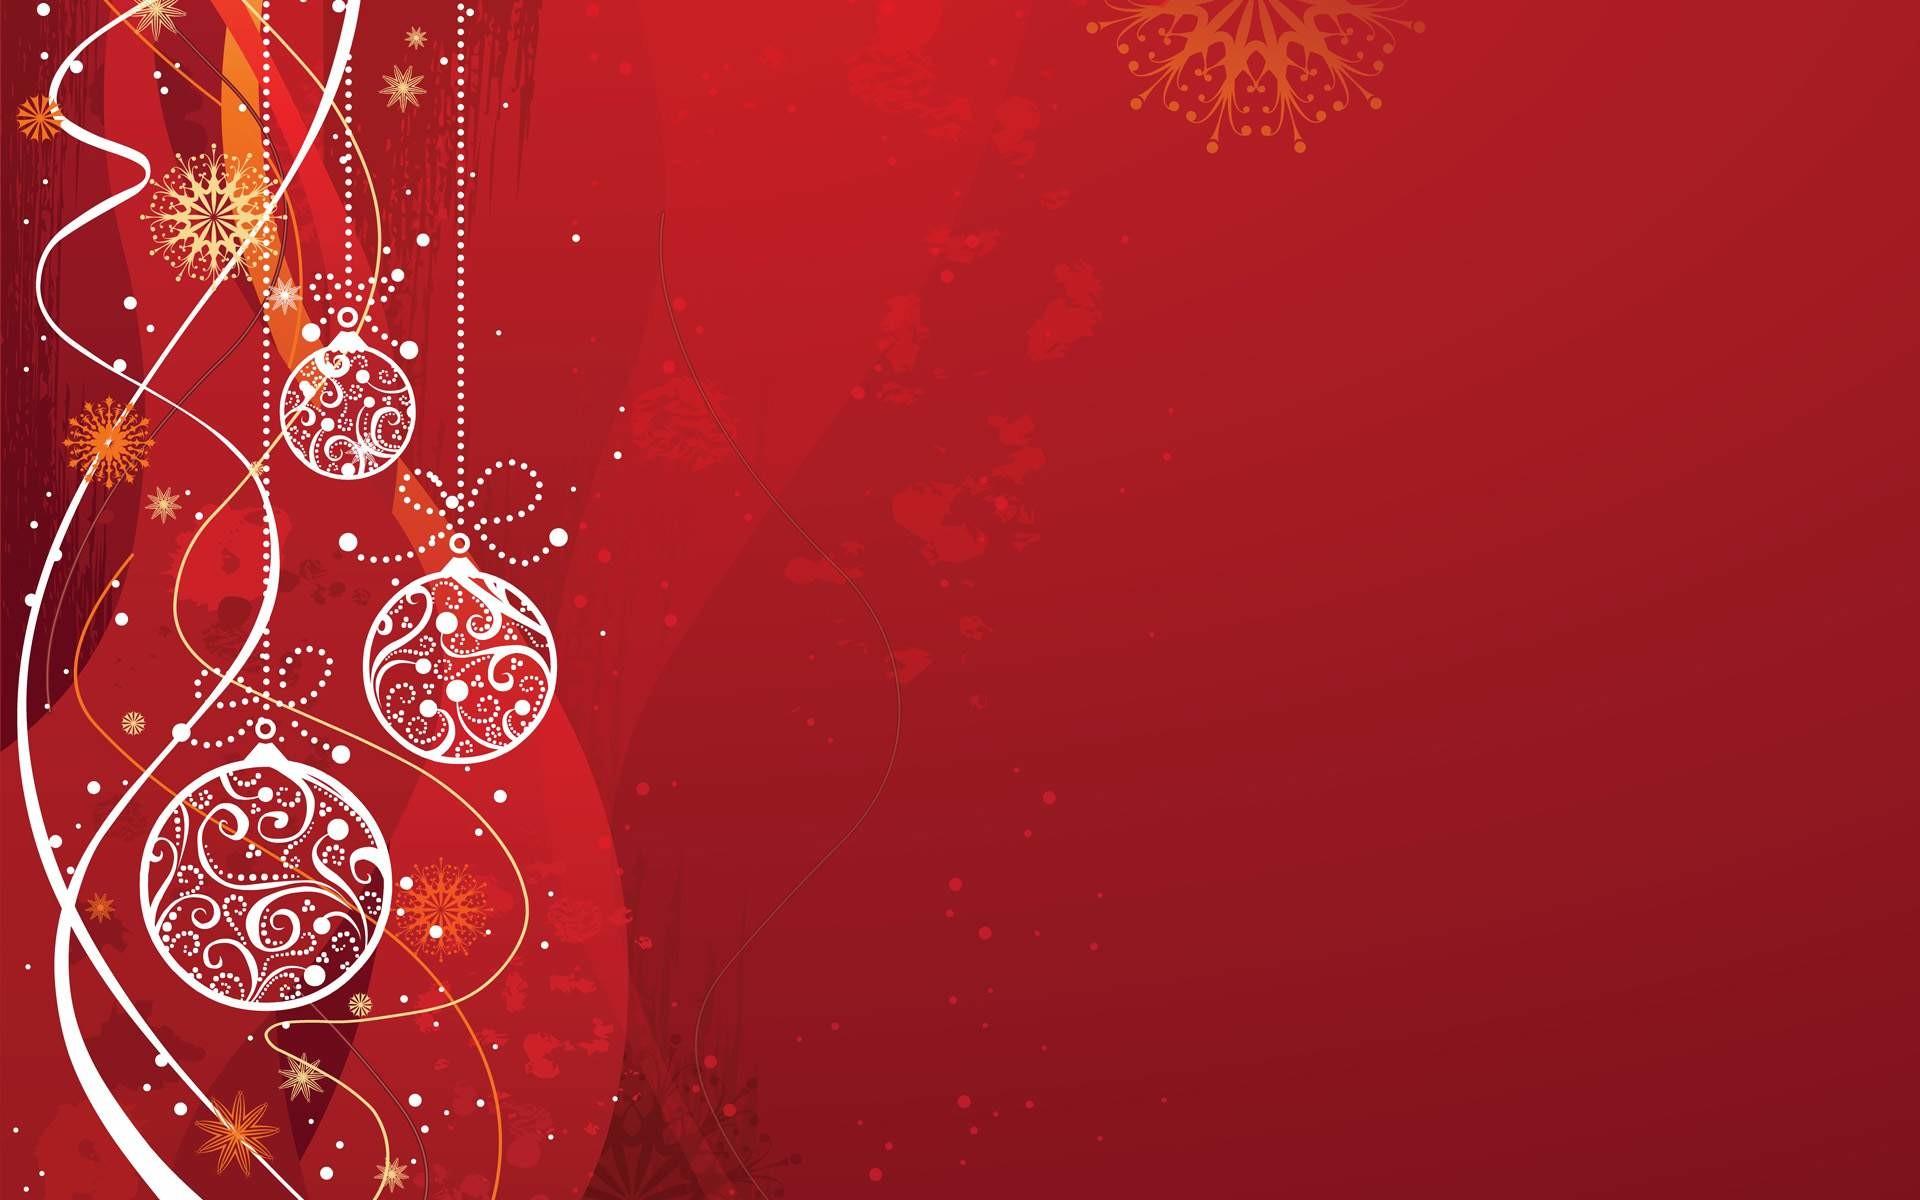 free christmas background clipart   christmas wallpapers for vista ,  wallpaper, desktop, backgrounds .